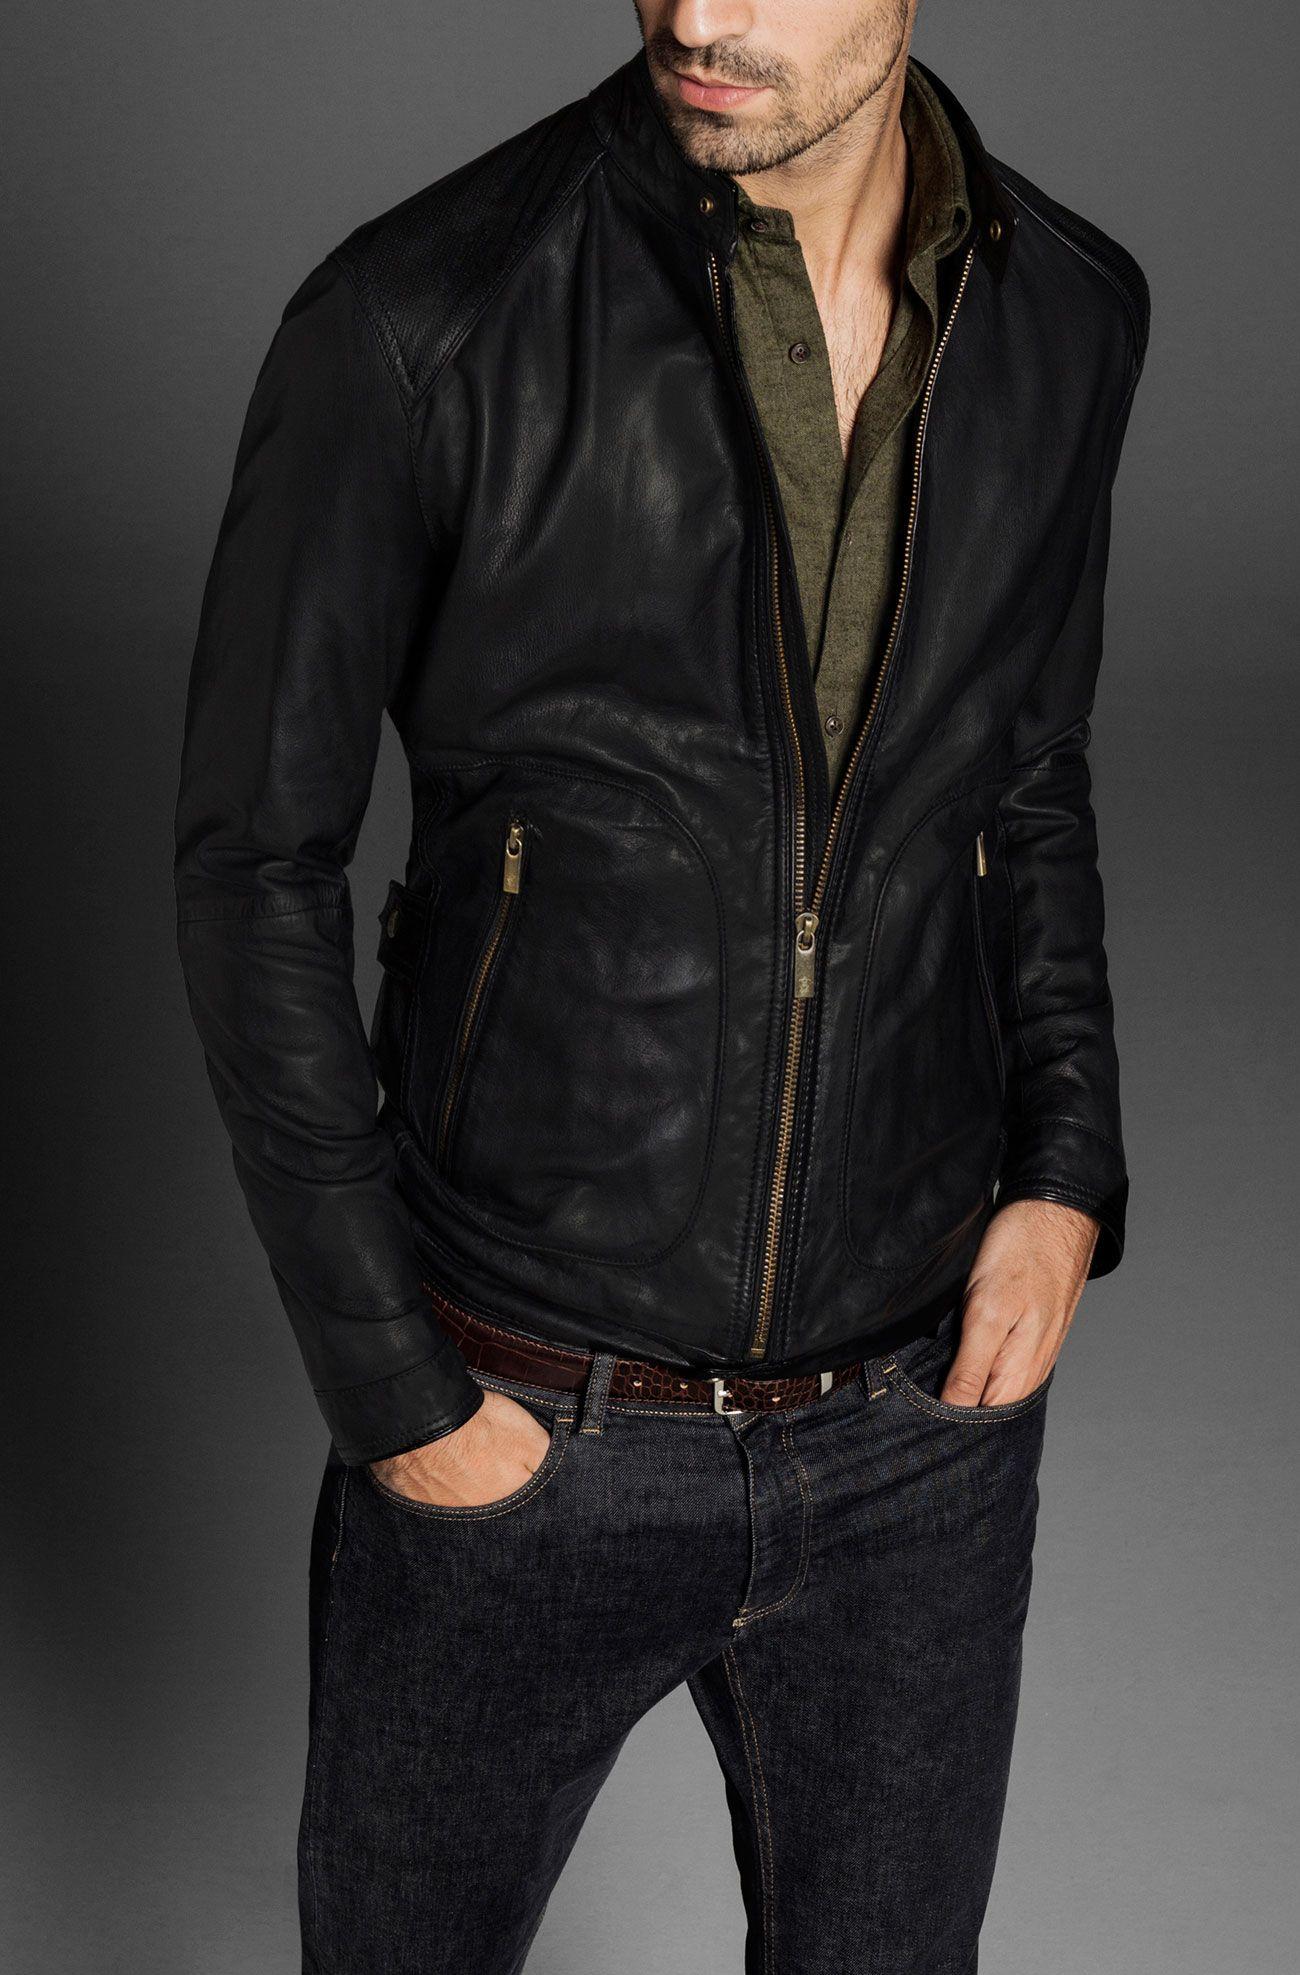 Black Leather Jacket Men Massimo Dutti Jackets Men Fashion Leather Jacket Men Style Leather Jacket Men [ 1975 x 1300 Pixel ]